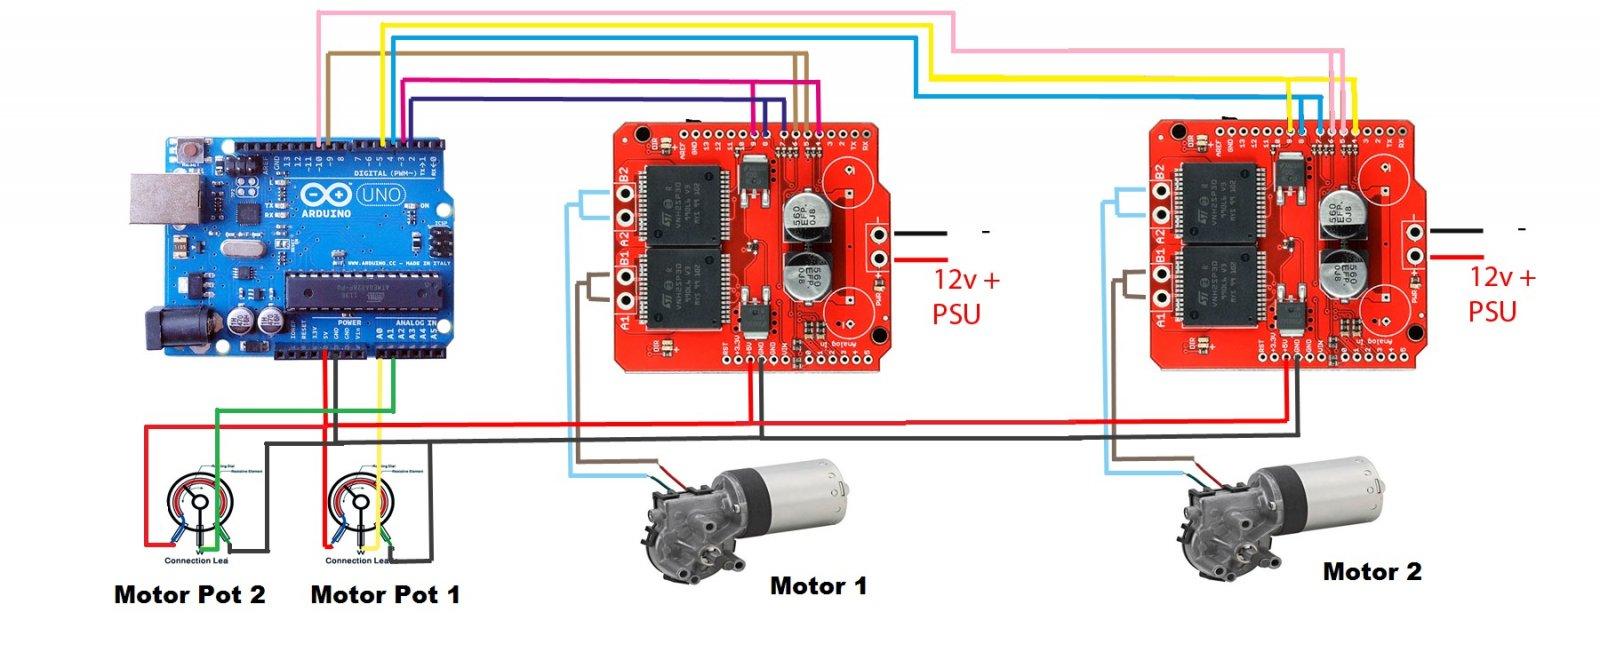 smc motor wiring diagram 1961 chevy pickup wiring diagram Toshiba Wiring Diagram  GeneralAire DS25 Lawn Genie Wiring Diagram Generic Wiring Diagram